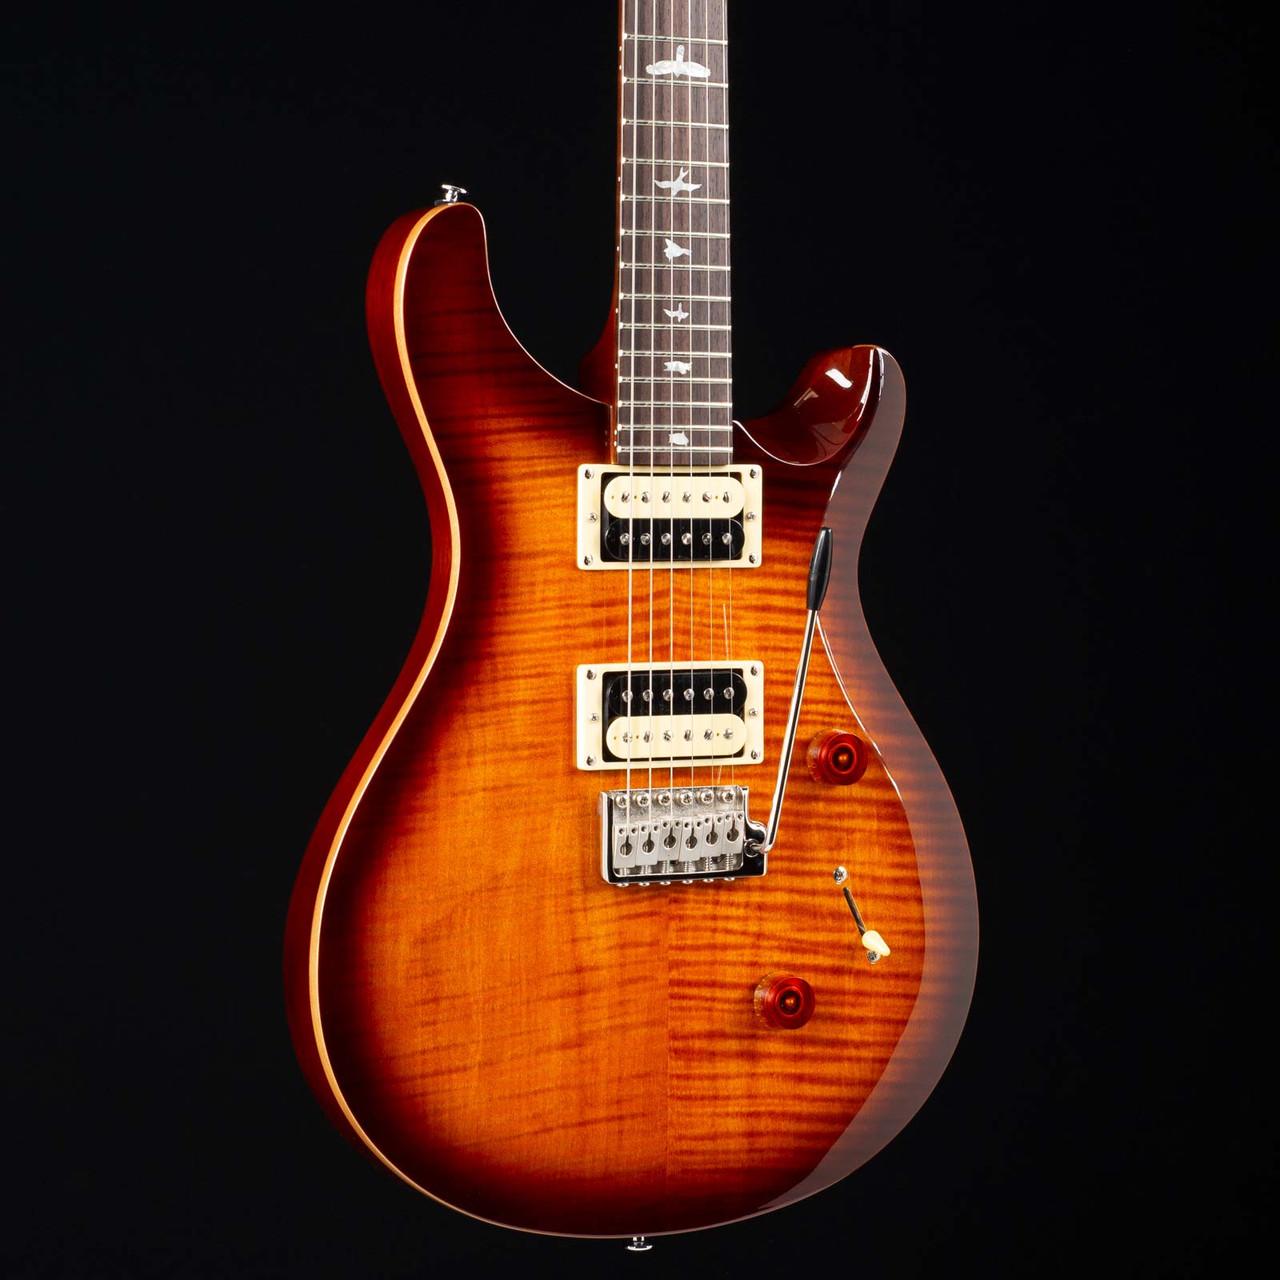 Nickel Treble Prs Guitars Hfs